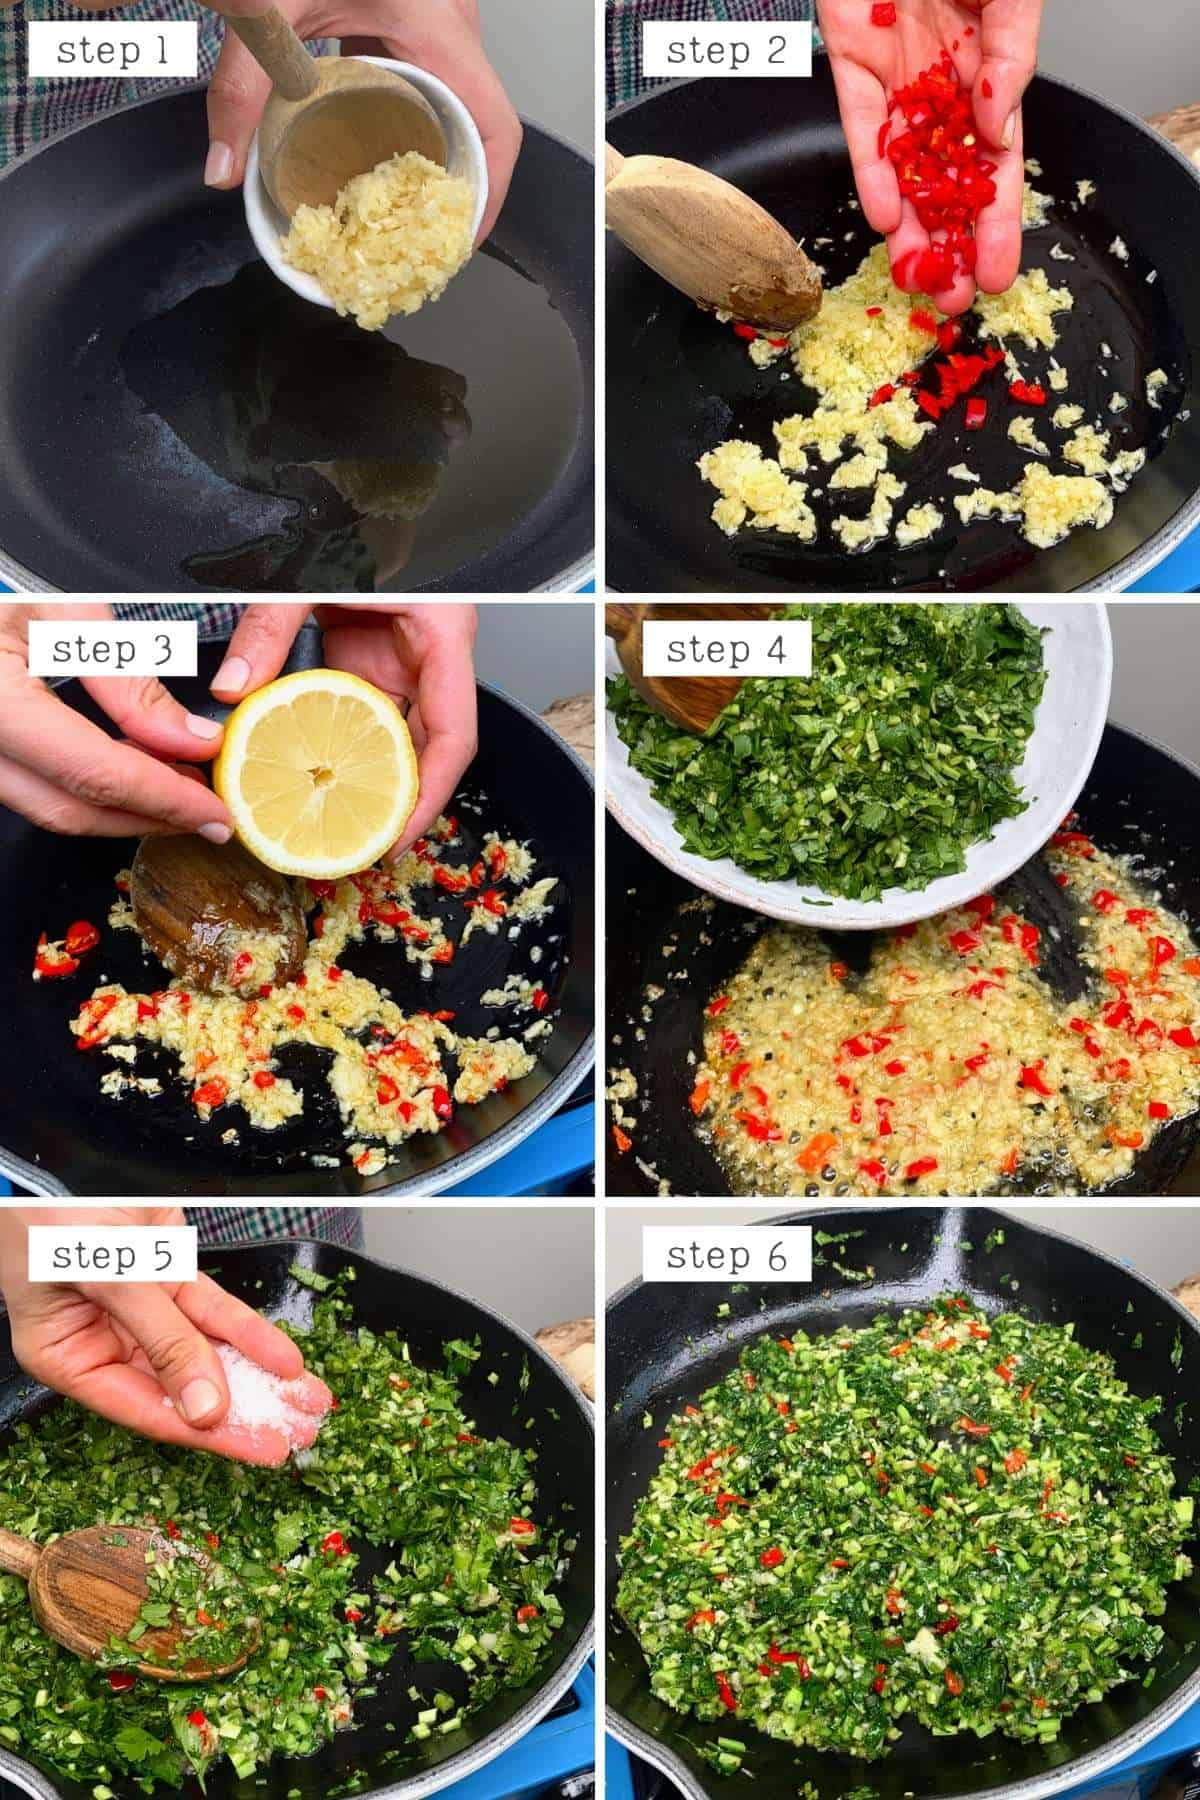 Steps for sautéing cilantro and garlic